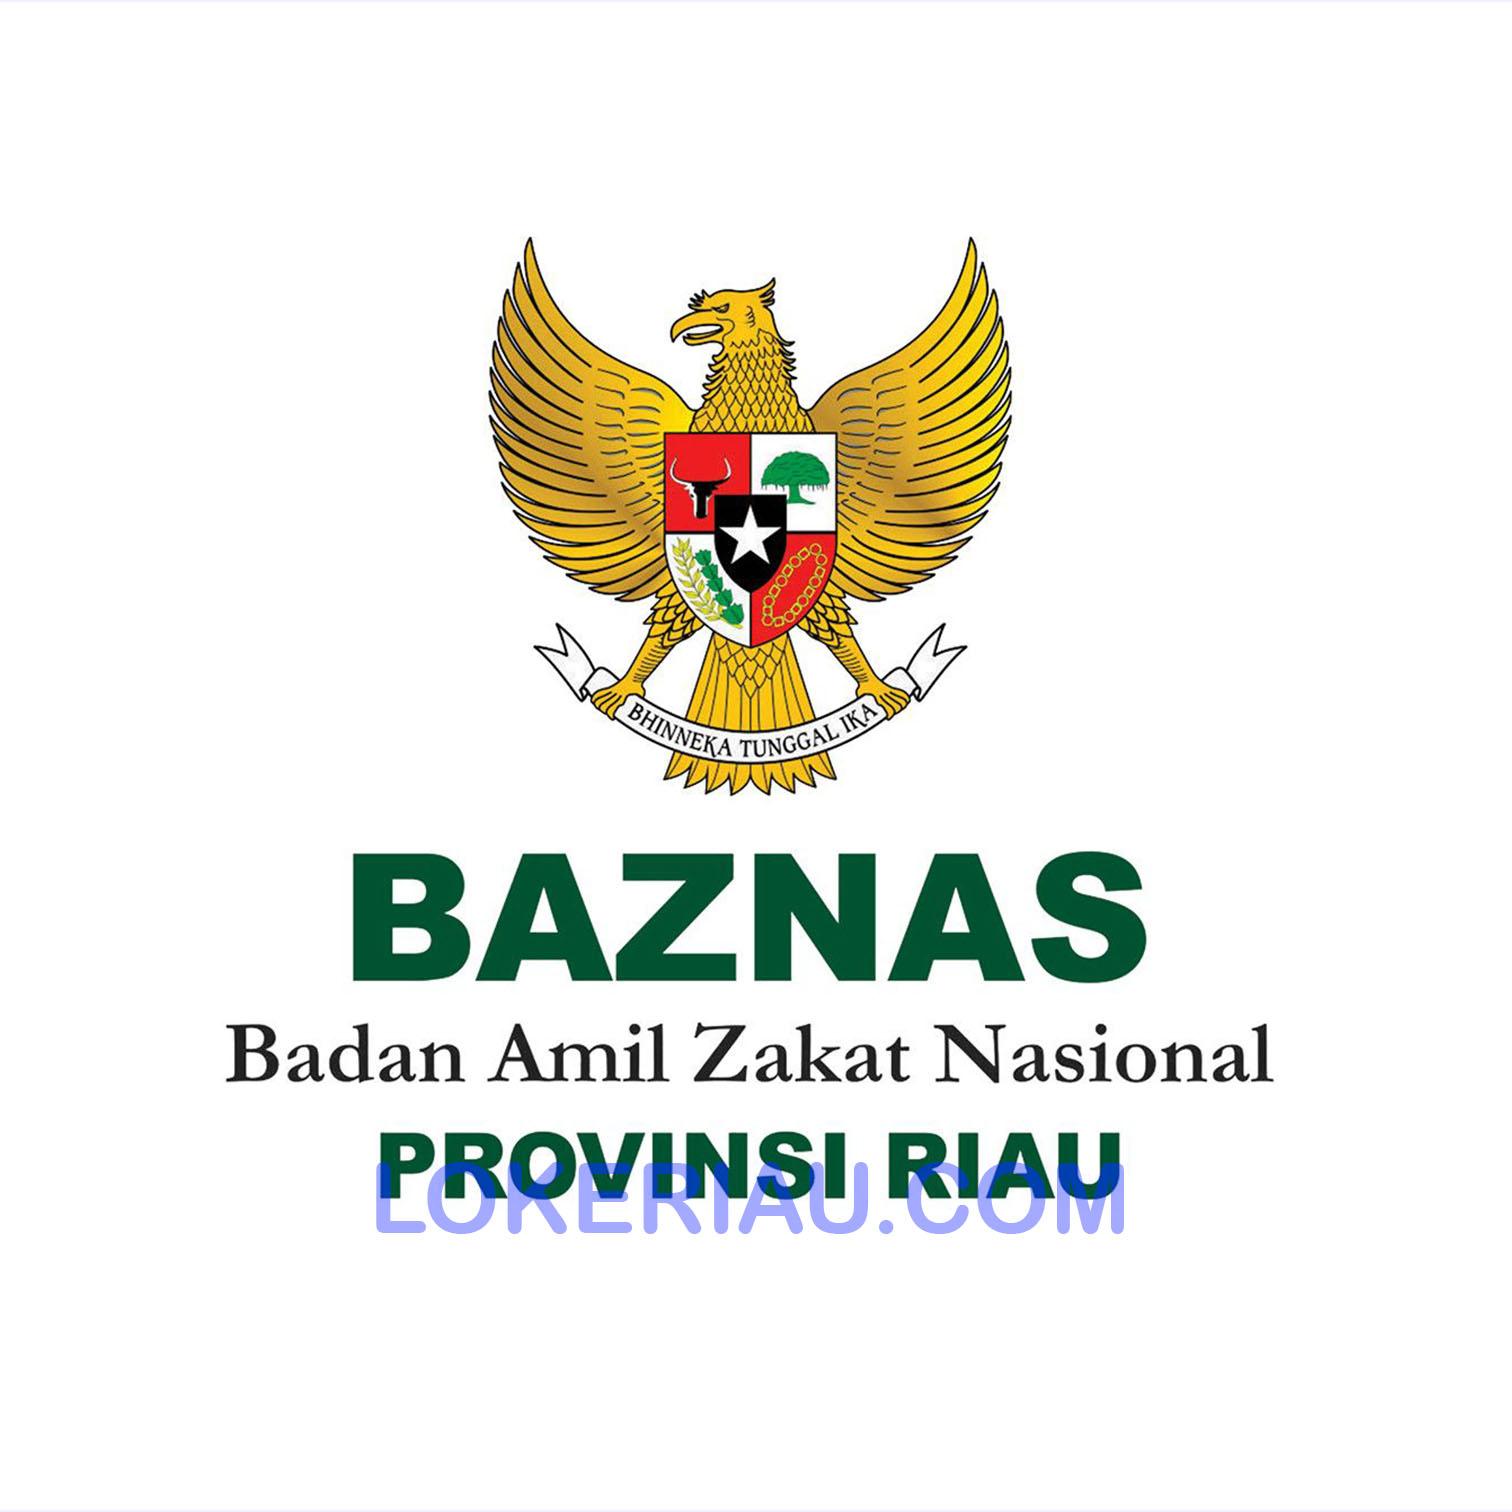 Lowongan Kerja Baznas Provinsi Riau